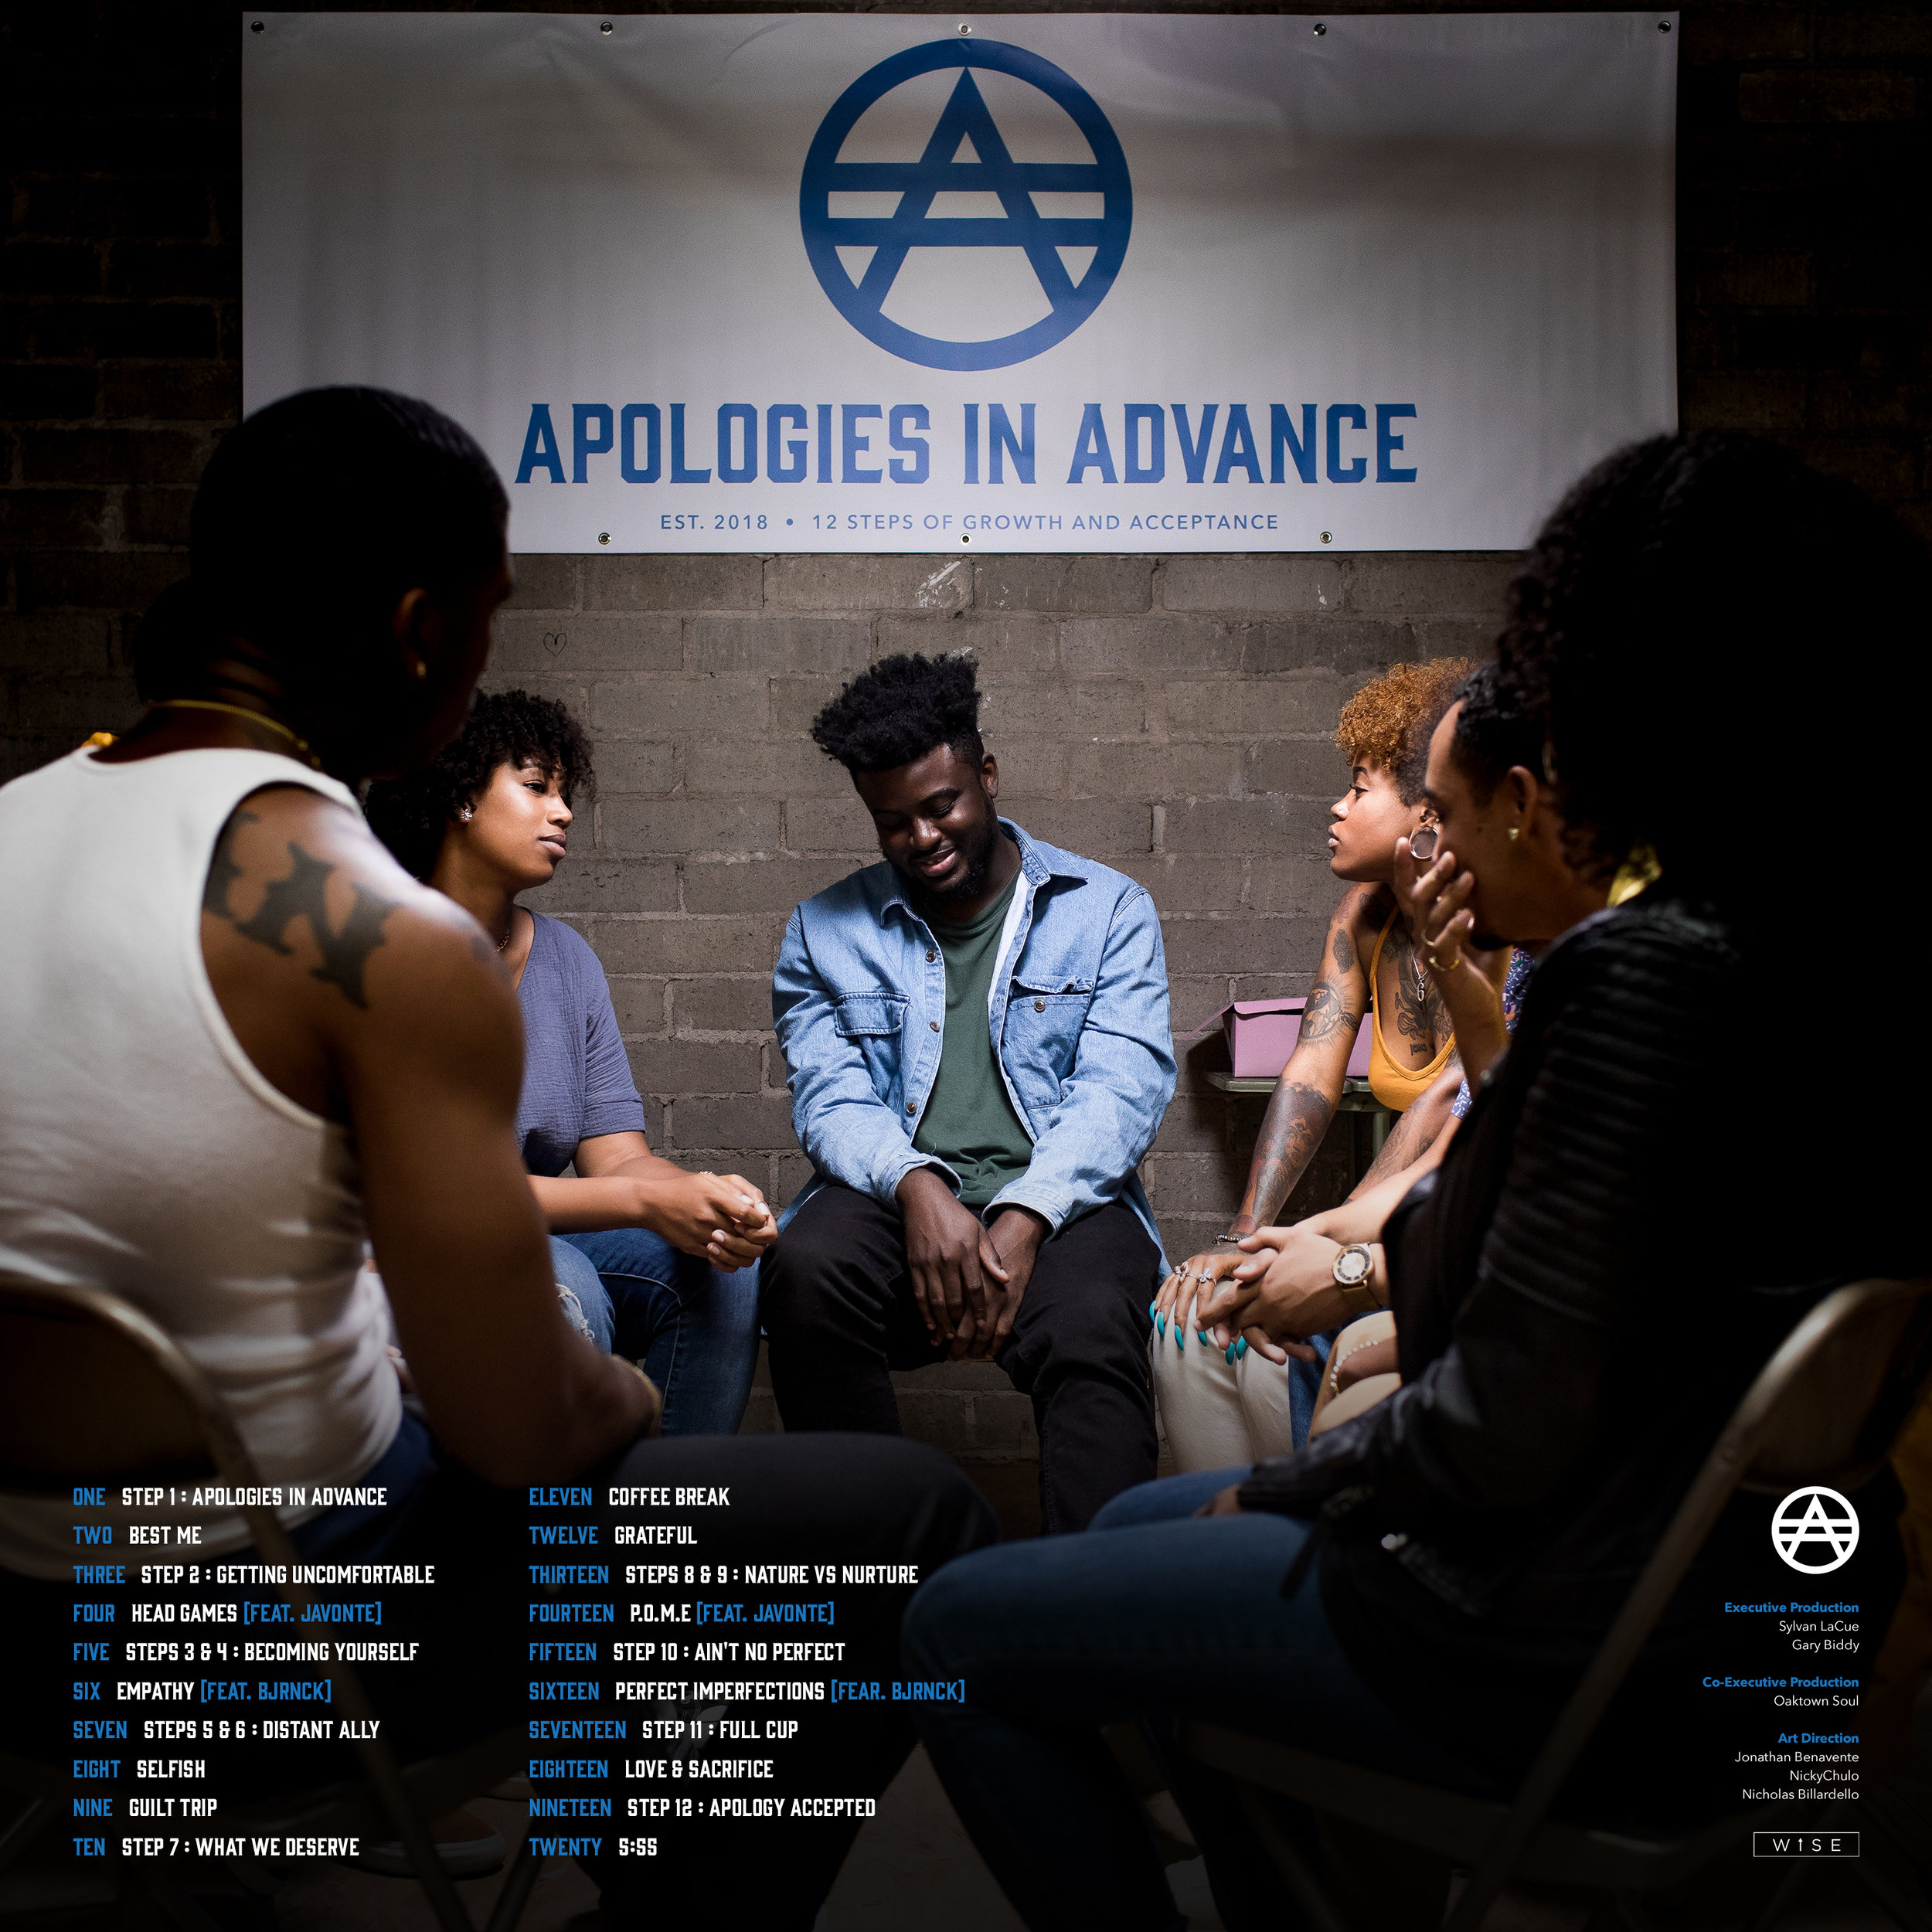 Apologies_in_advance_Back.JPG